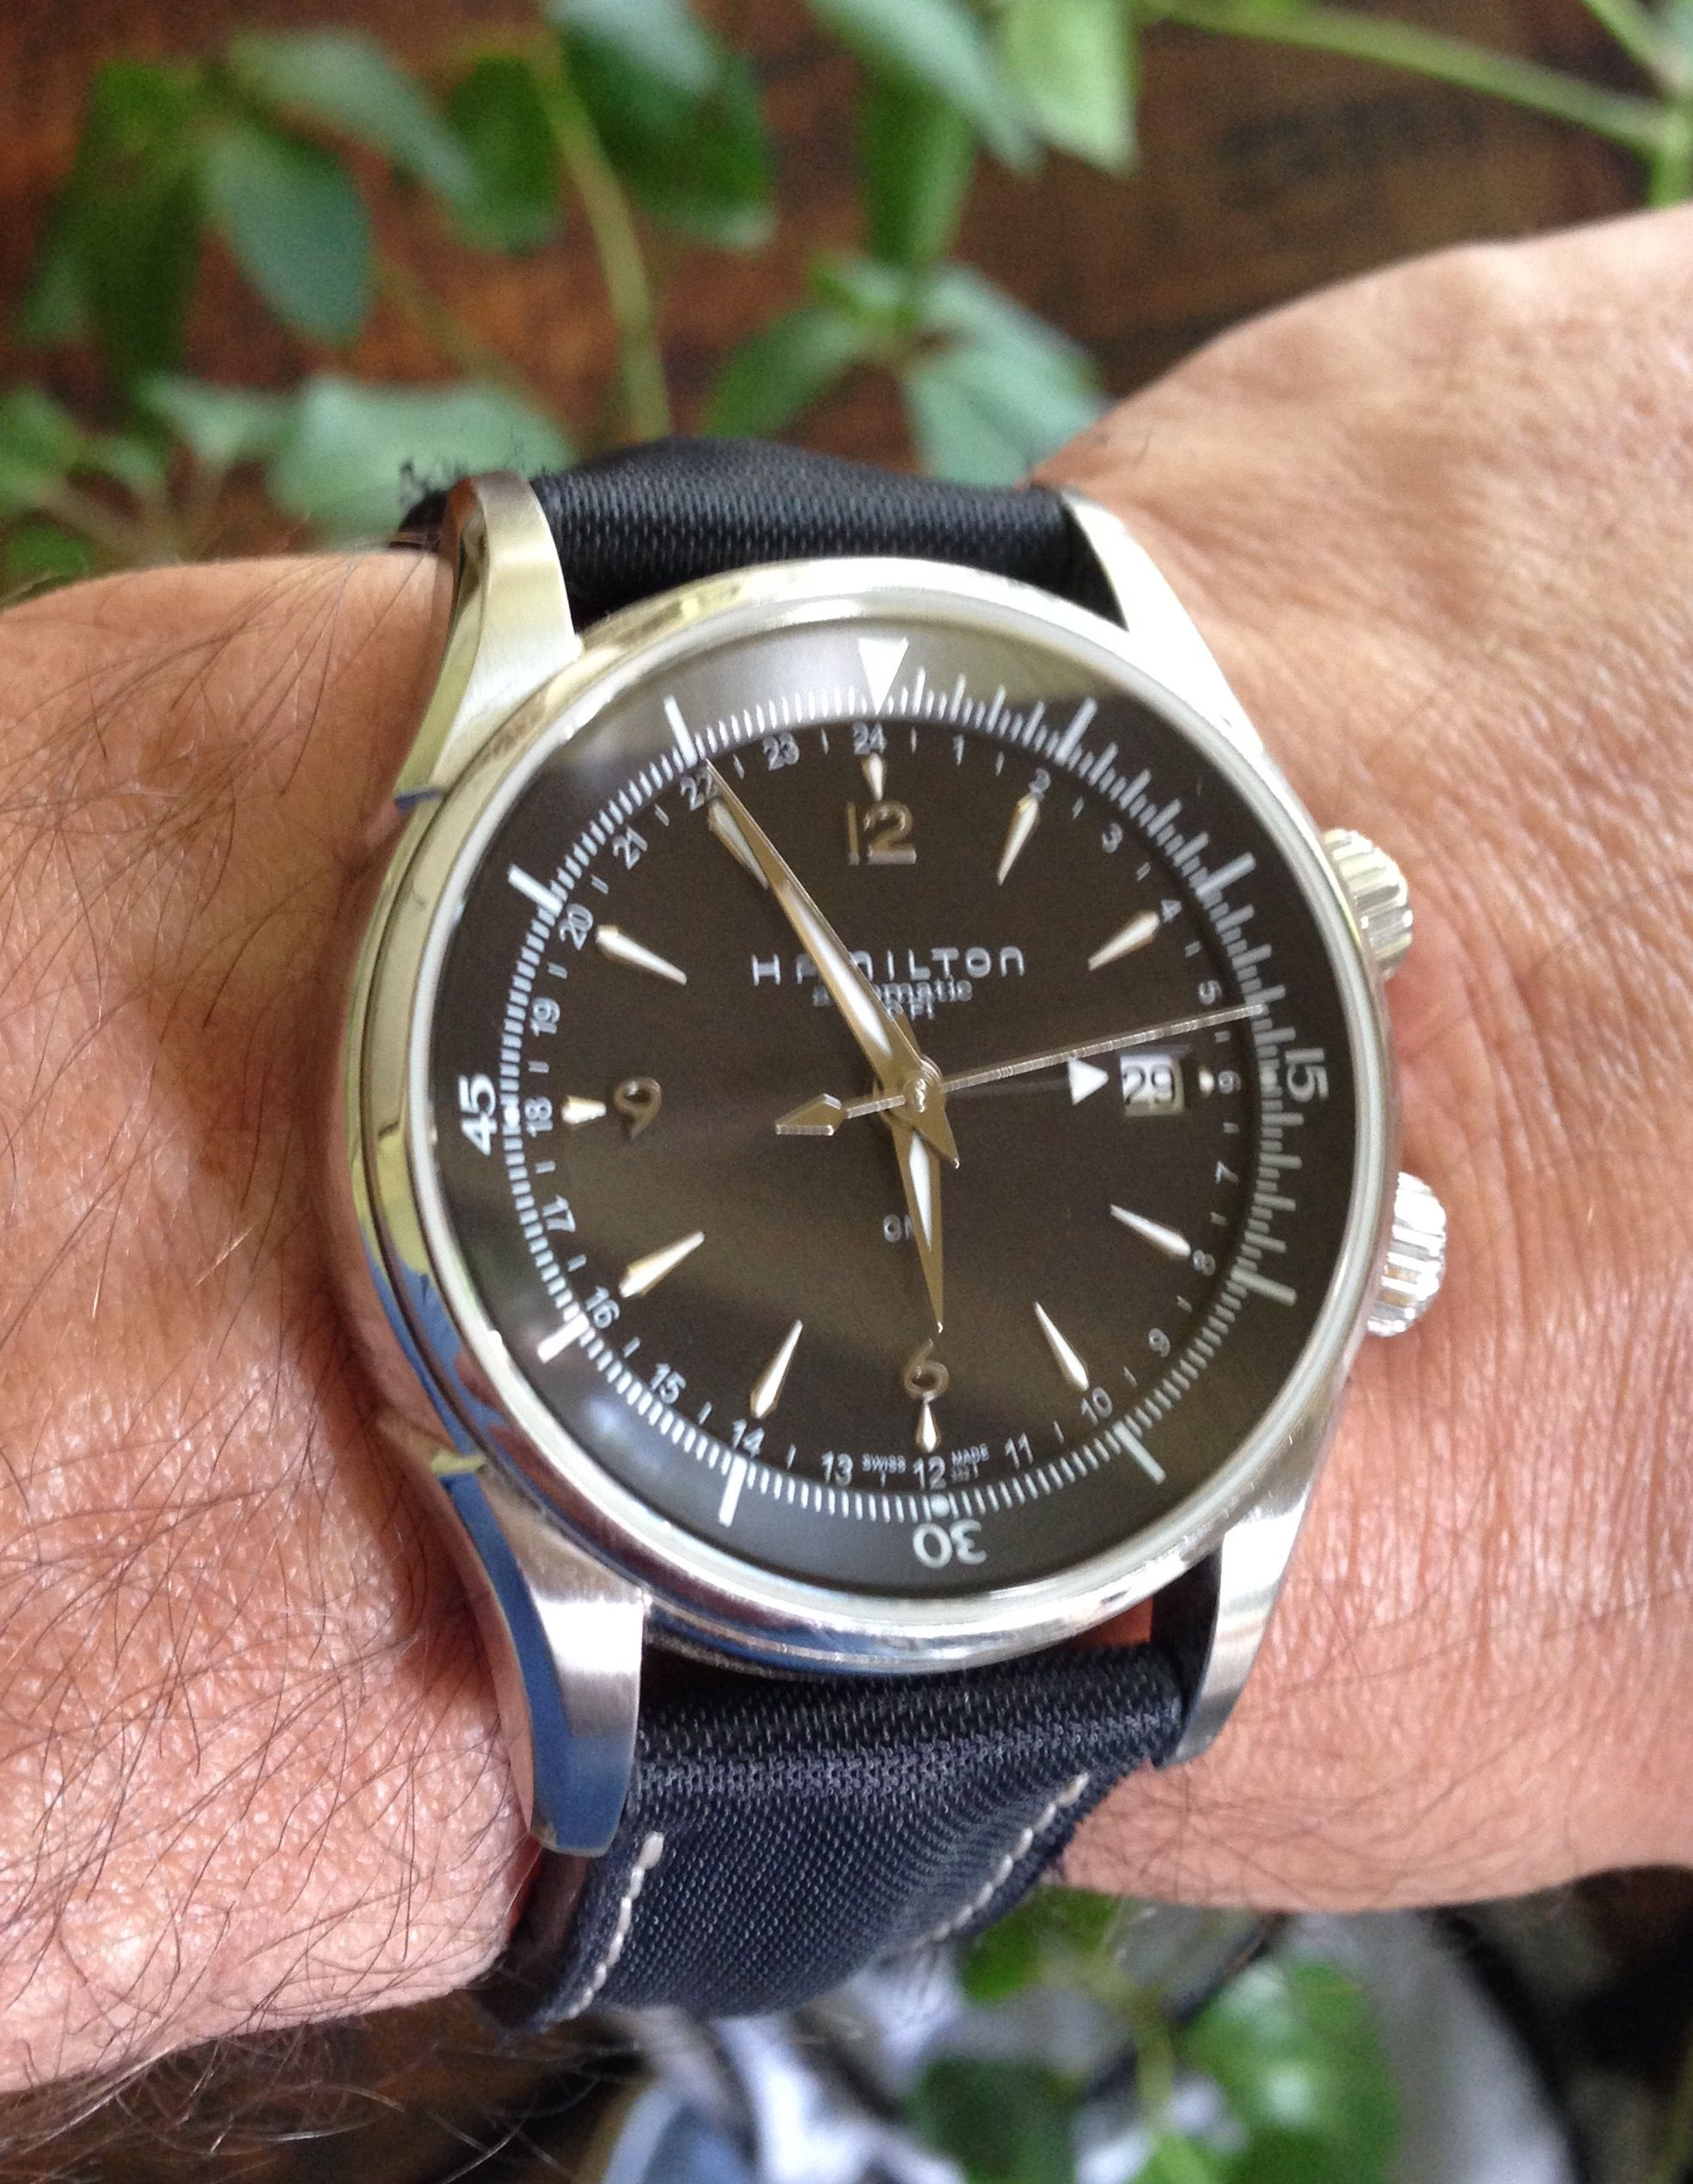 Real Movado watch or not? - forums.watchuseek.com